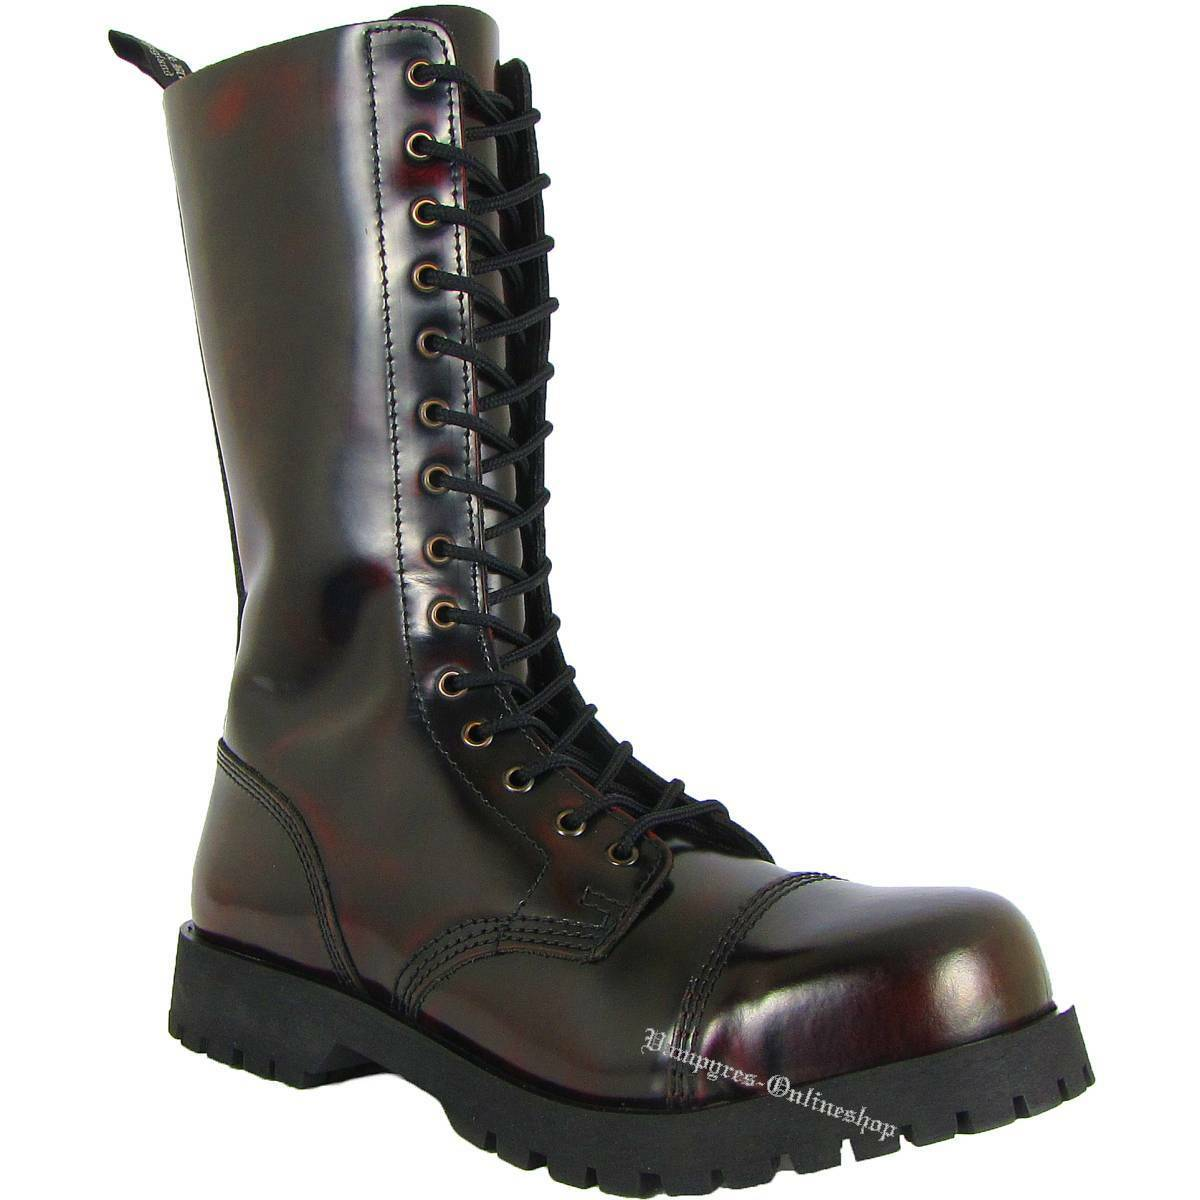 Boots & Braces 14 agujeros botas Burgundy Rub off rojo negro and rangers cuero